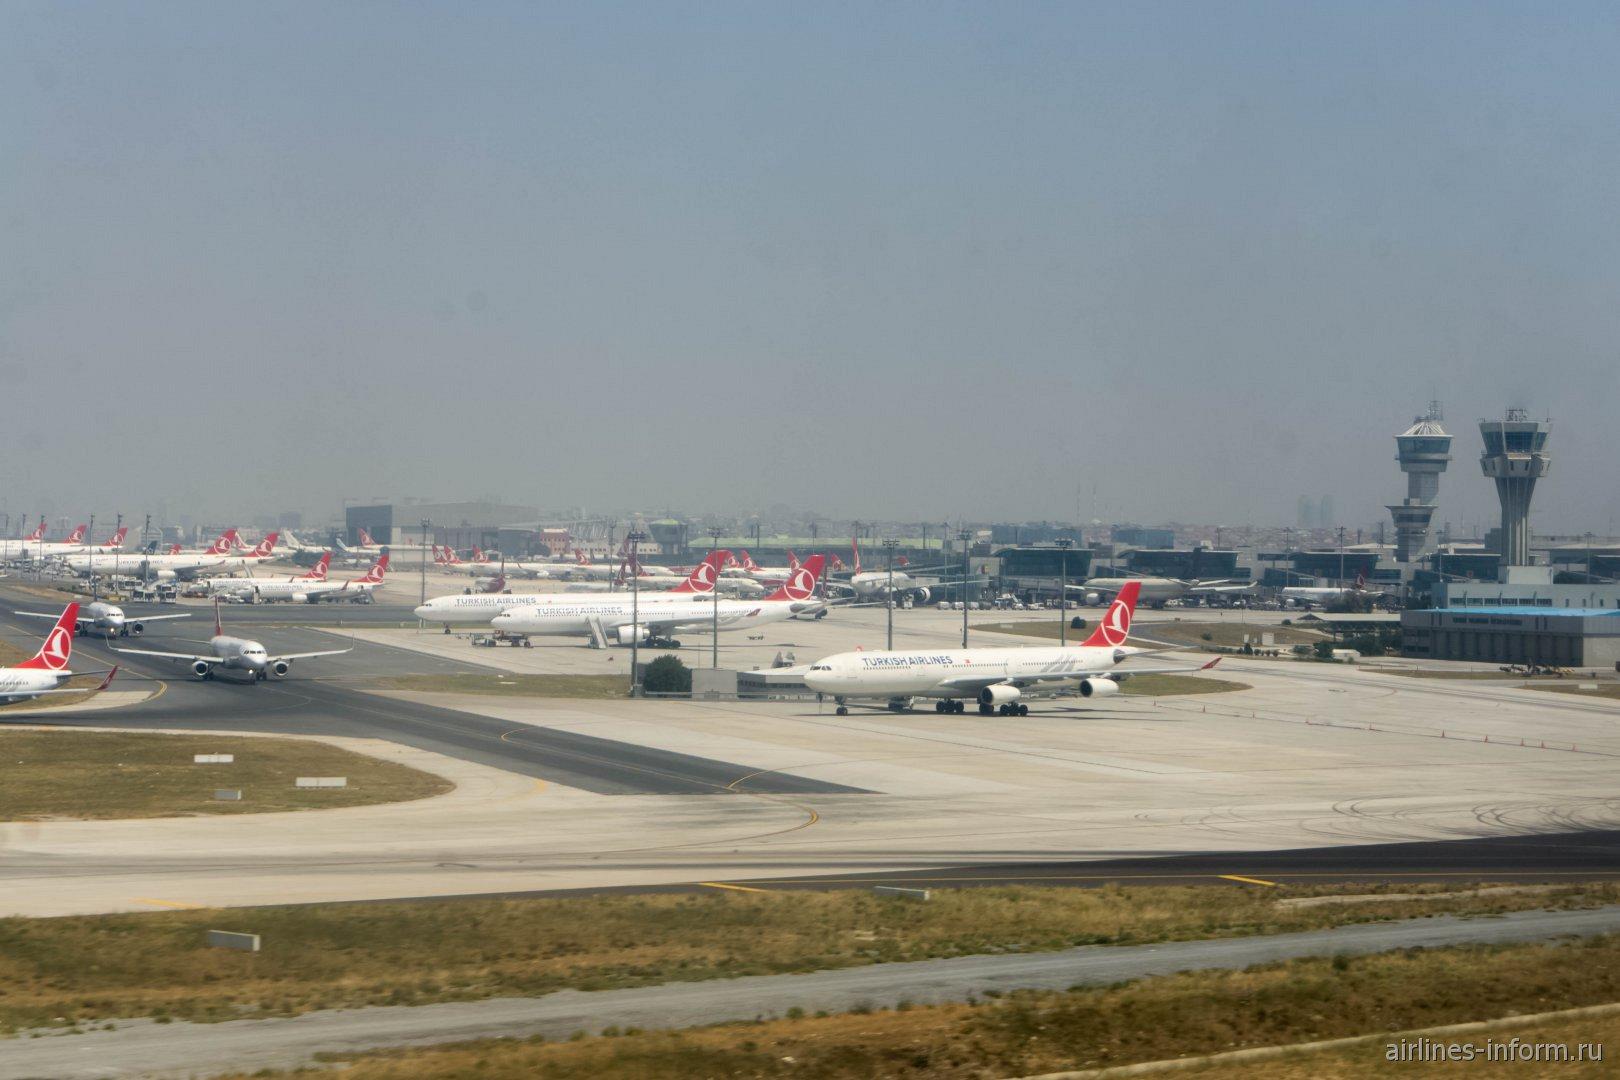 Перрон аэропорта Стамбул Ататюрк